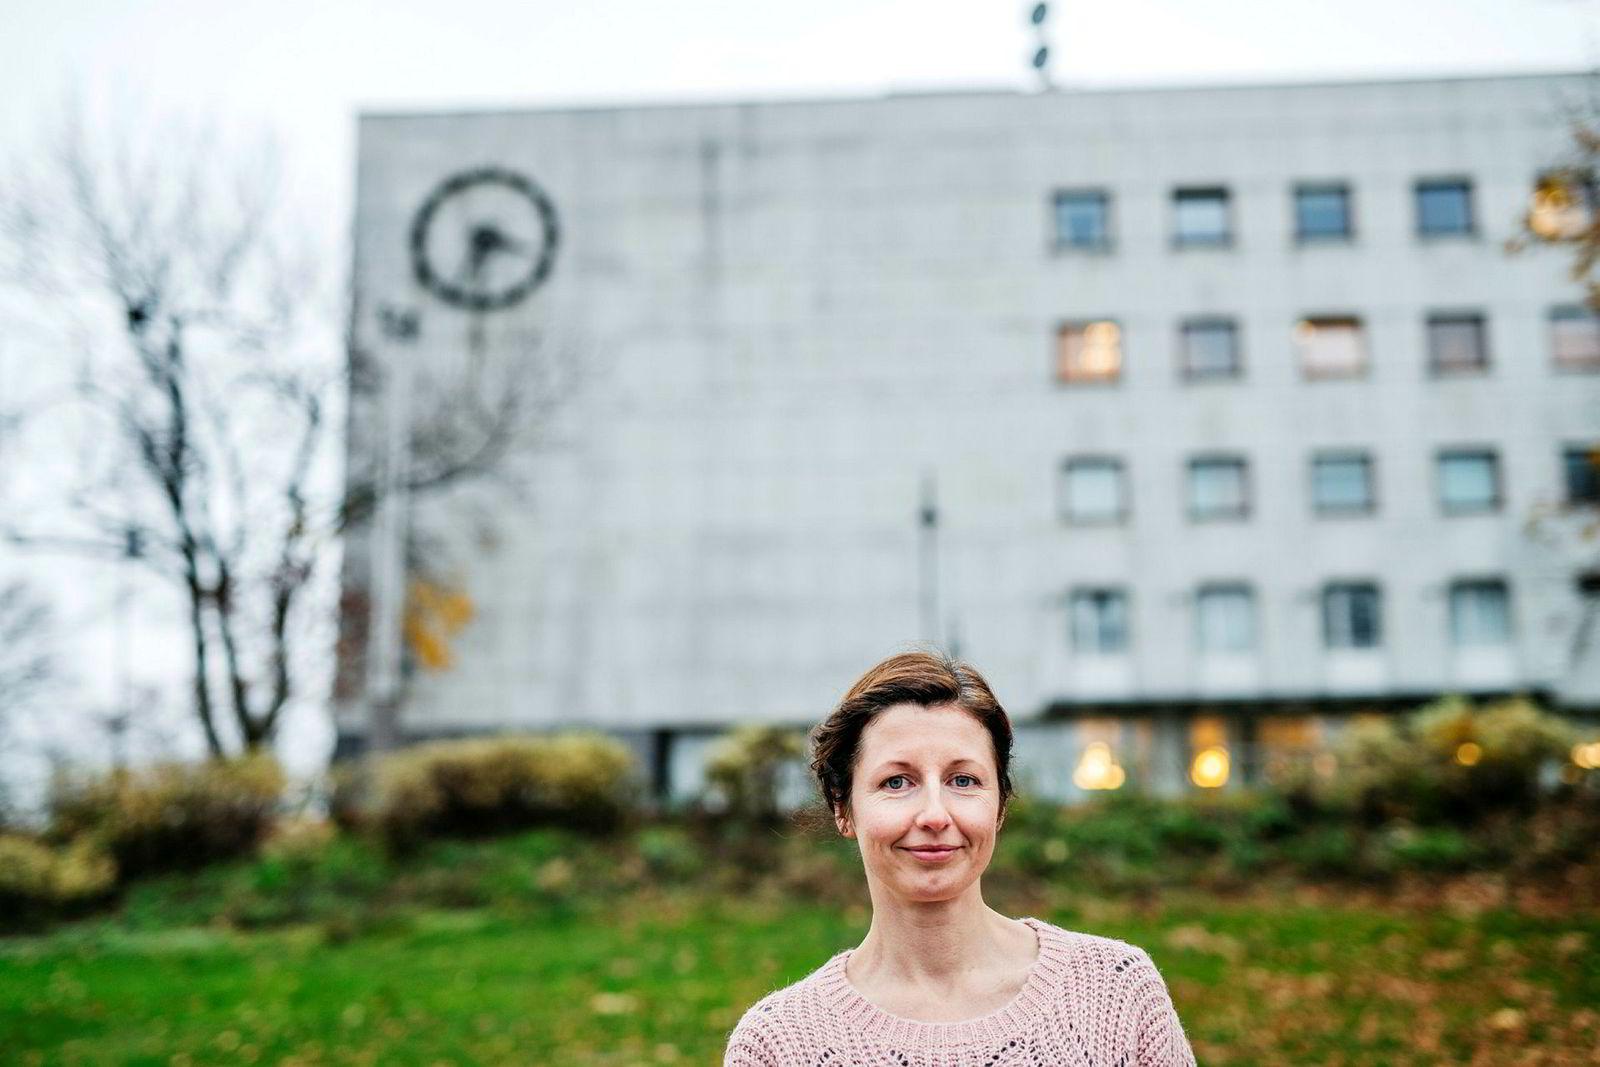 Radioprogrammene «Språkteigen», «Abels tårn» og «Utakt» har fått egne Facebook-grupper hos NRK. Her Laurie MacGregor i NRK.